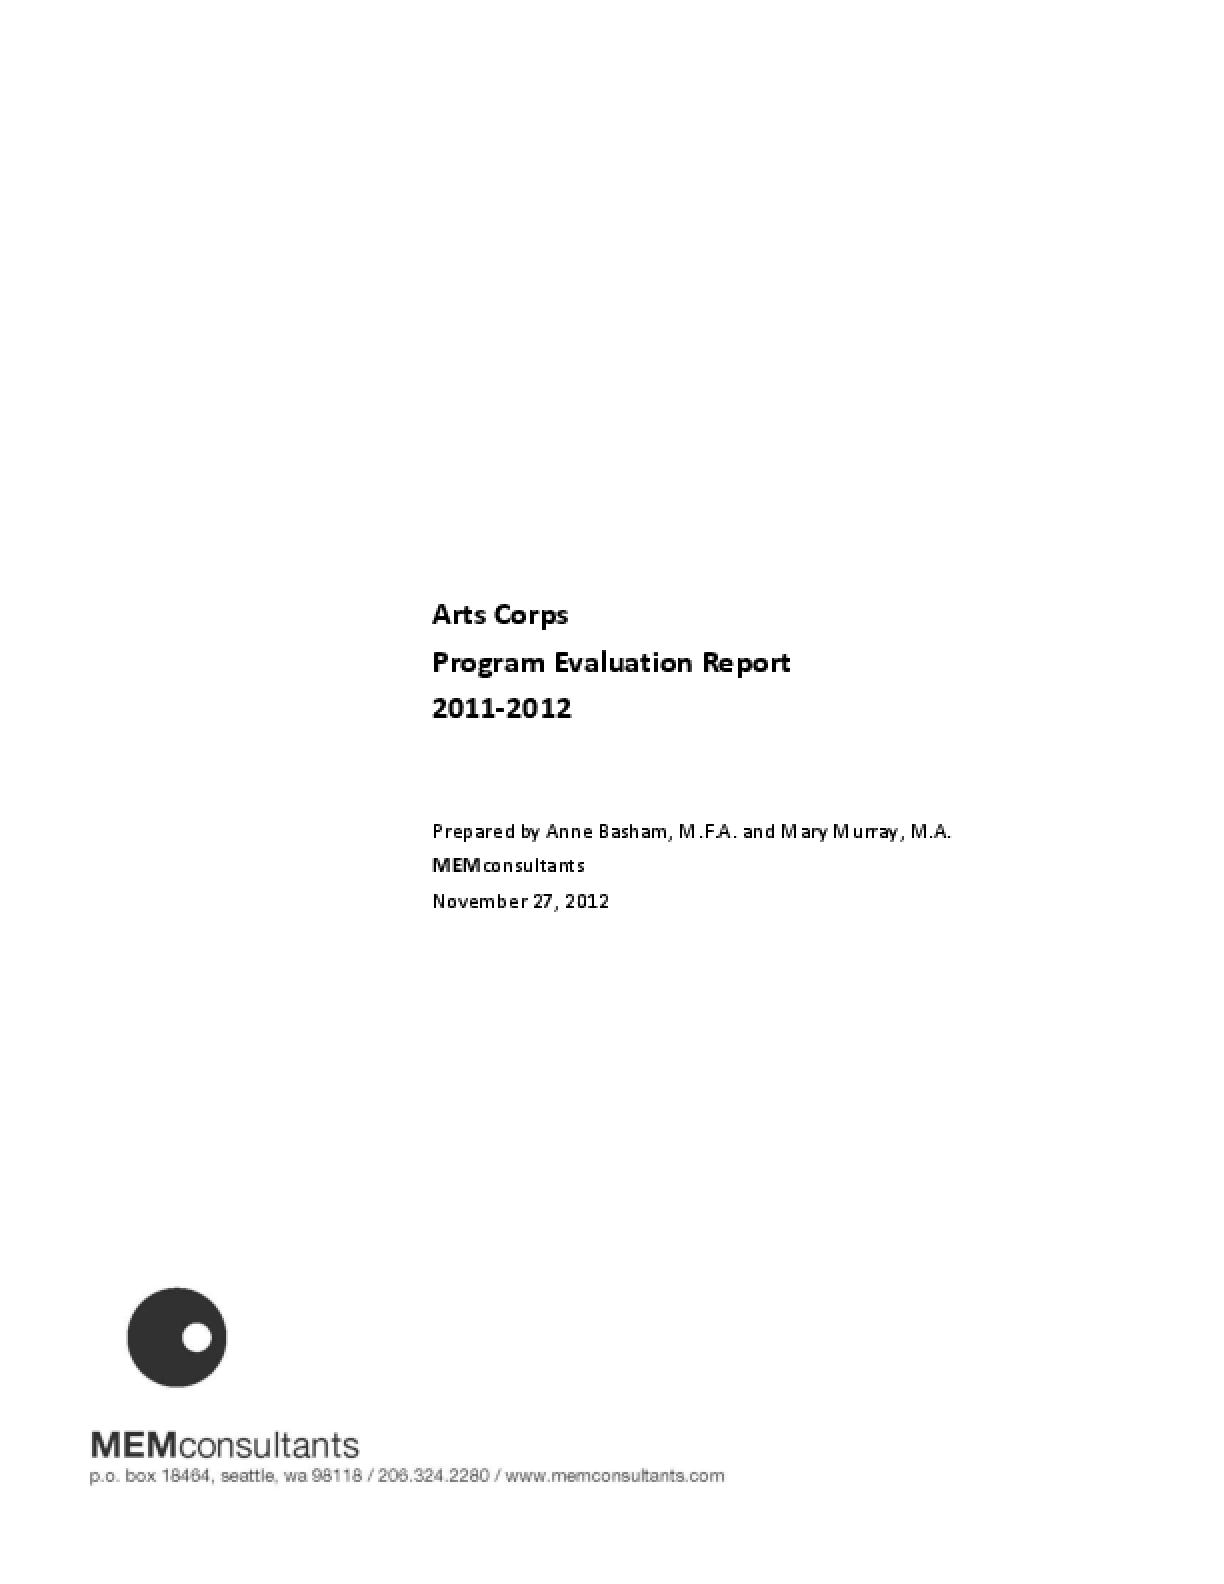 Arts Corps Program Evaluation Report